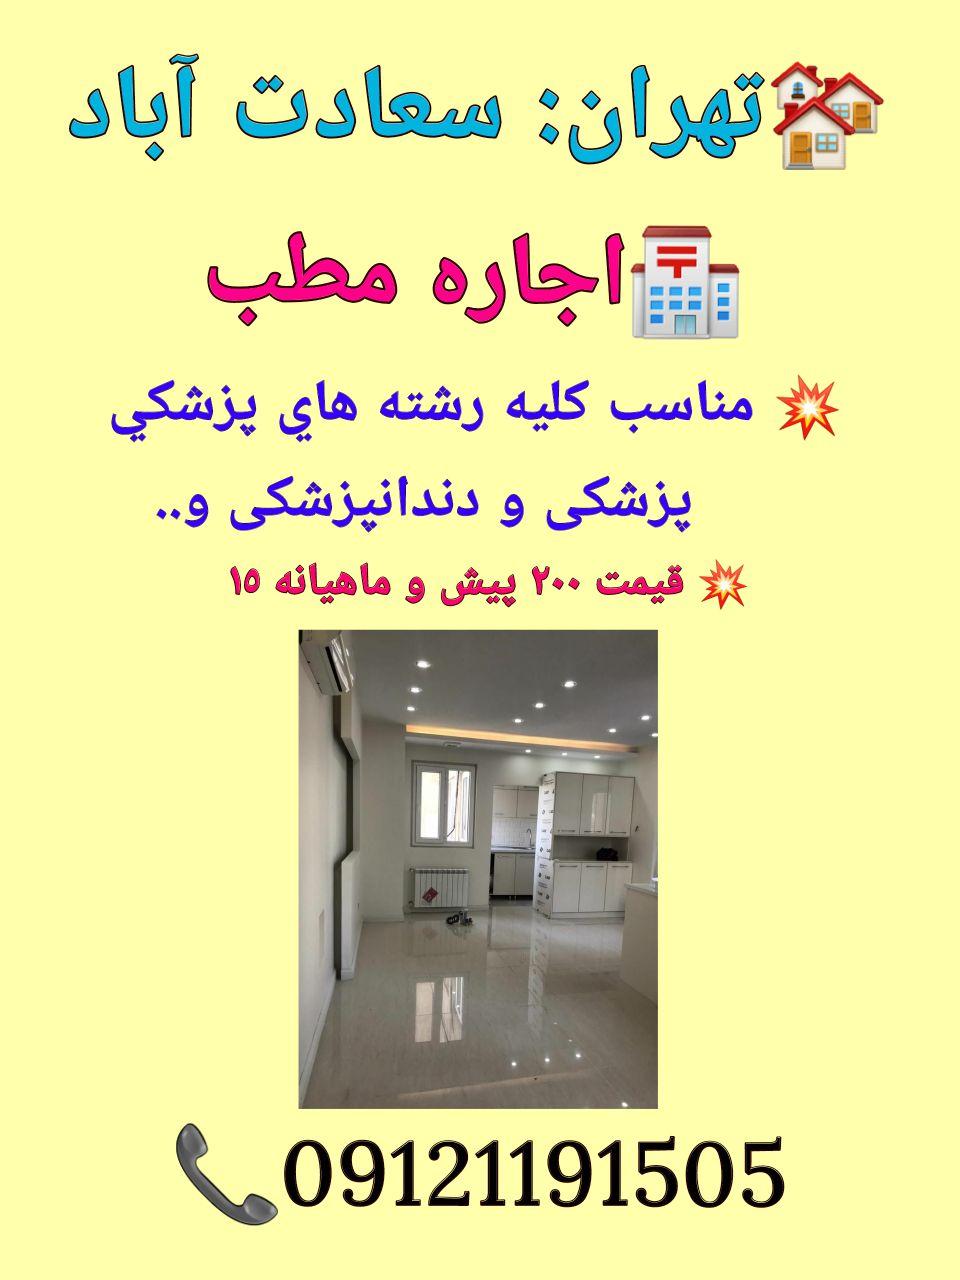 تهران: سعادت آباد، اجاره مطب